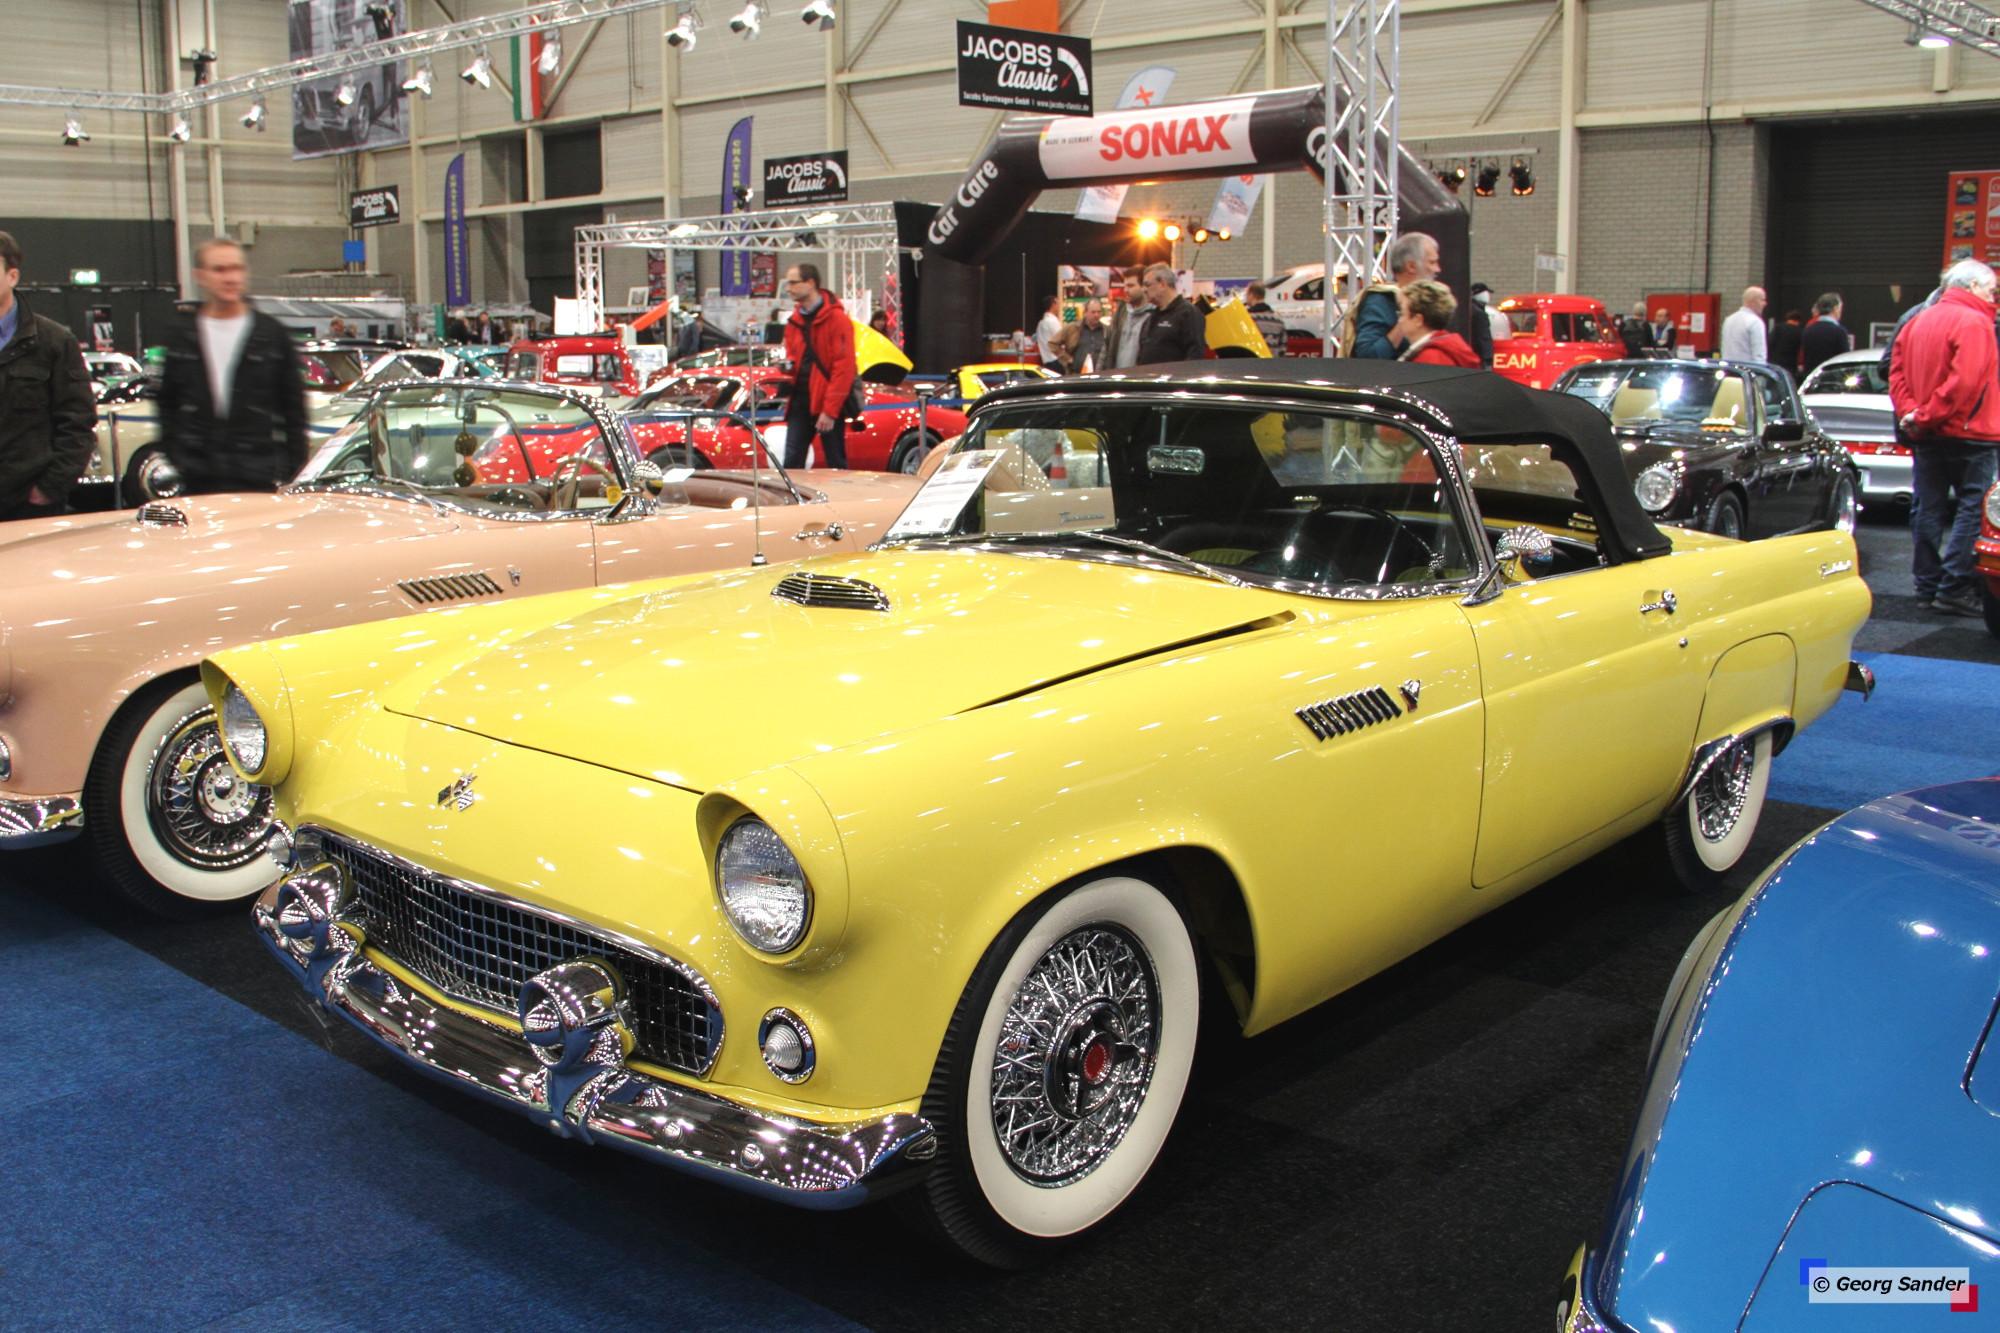 Wallpaper : old, Netherlands, Ford, 2015, Cabrio, Vintage car, Inter ...